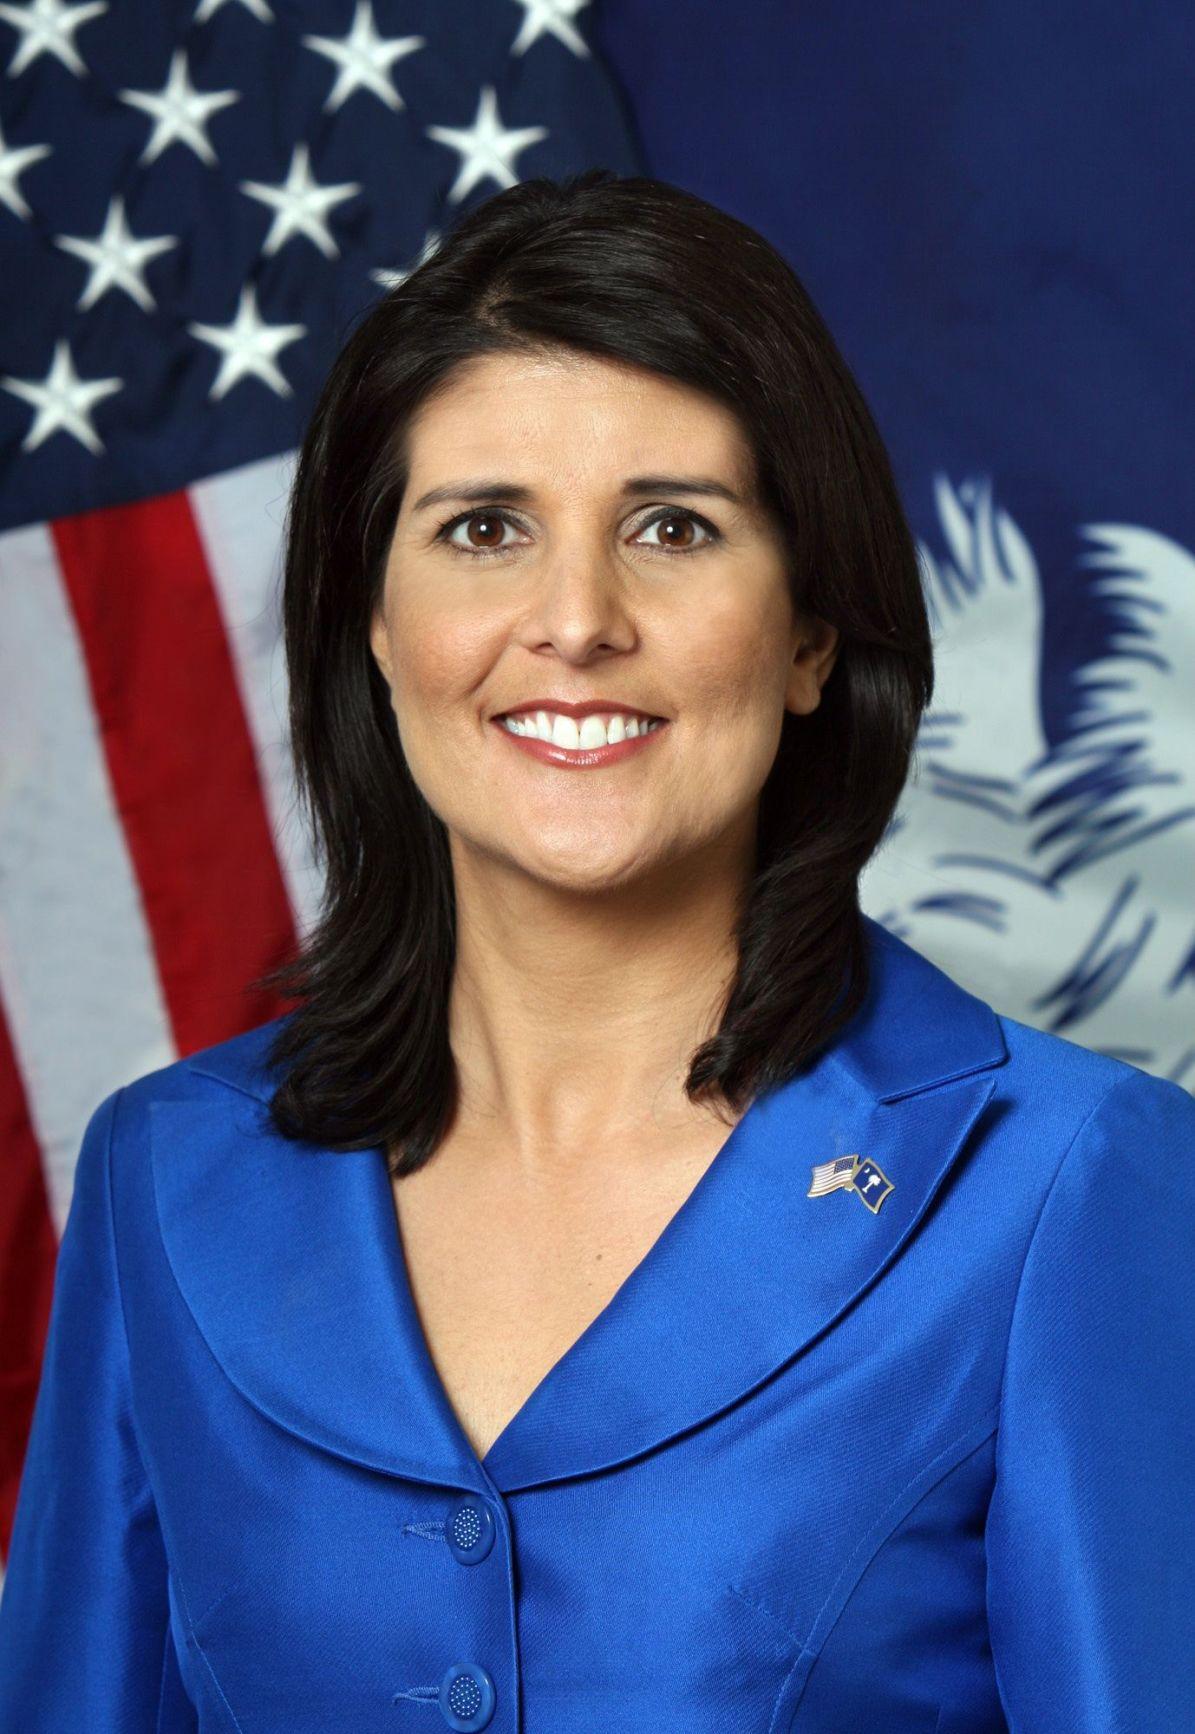 Haley backs plutonium removal, reasserts MOX lawsuit